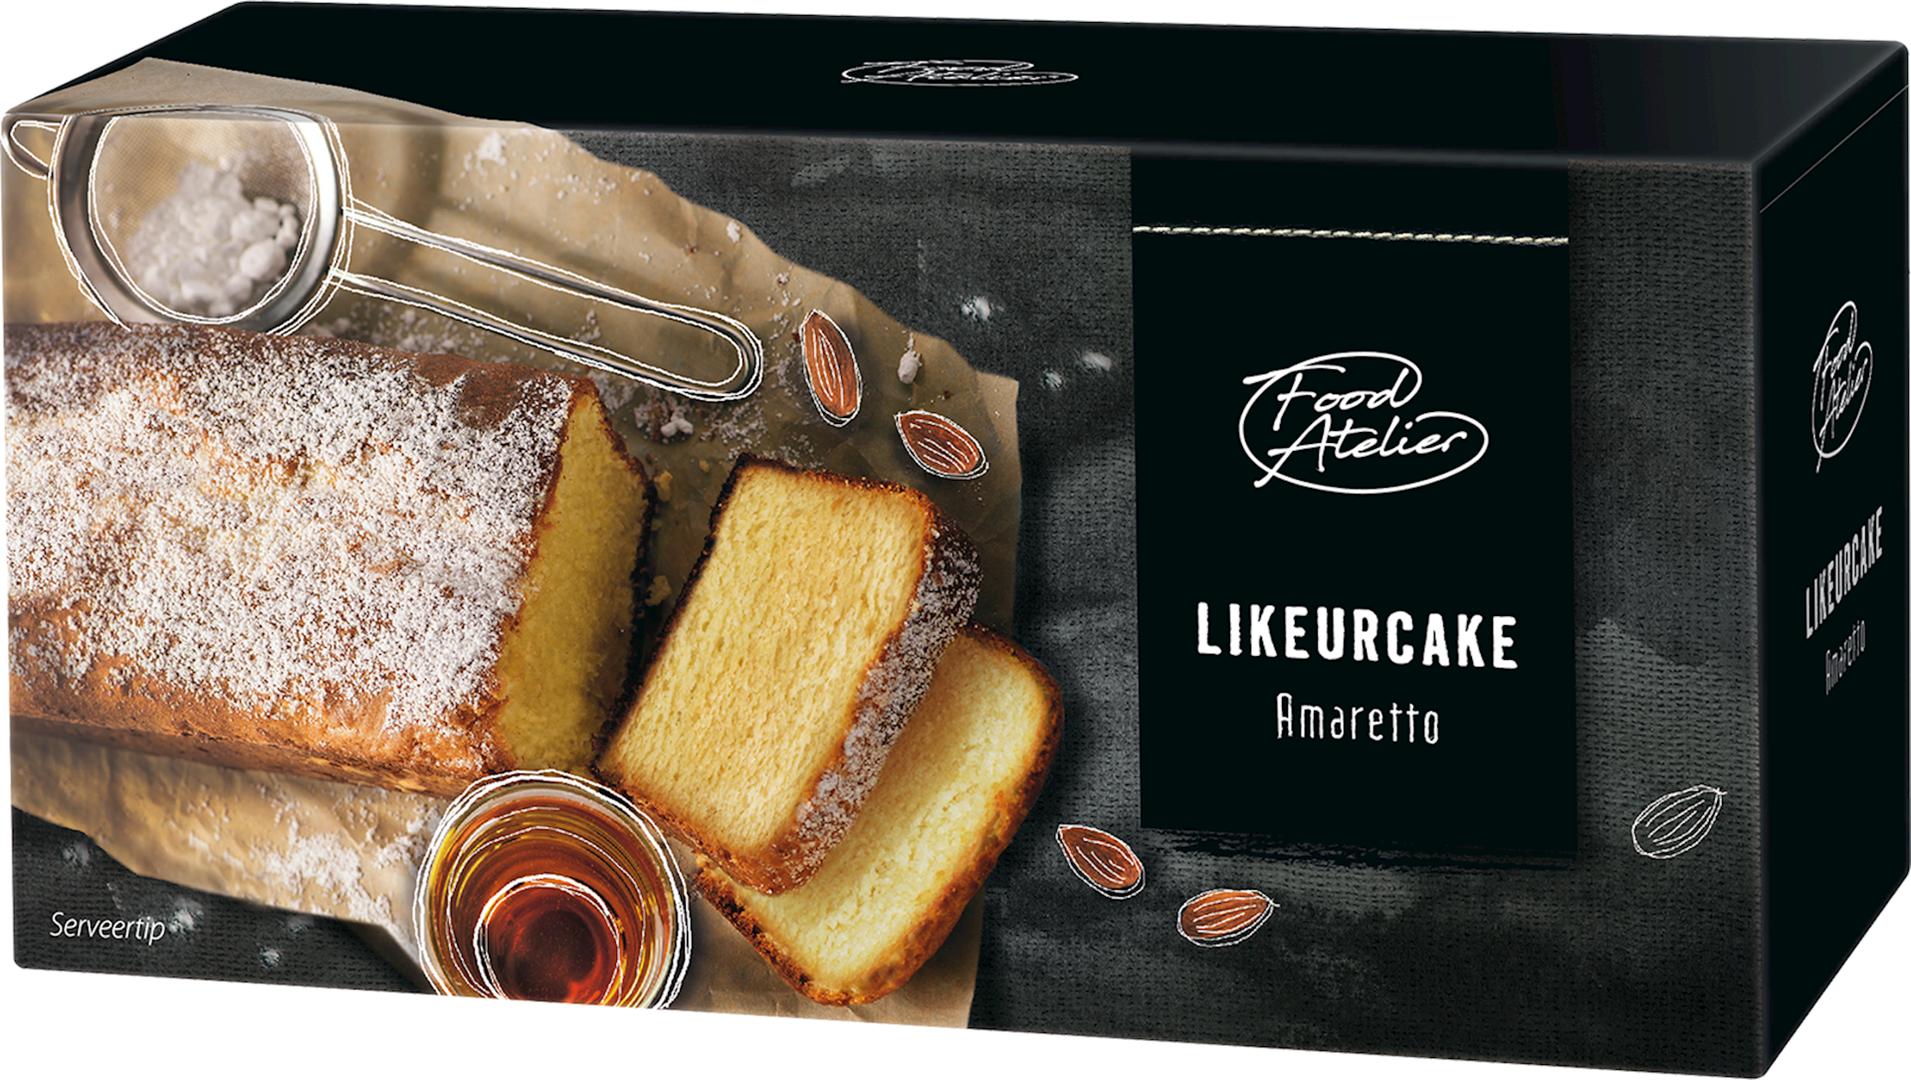 Productafbeelding Likeurcake Food atelier 400g doos